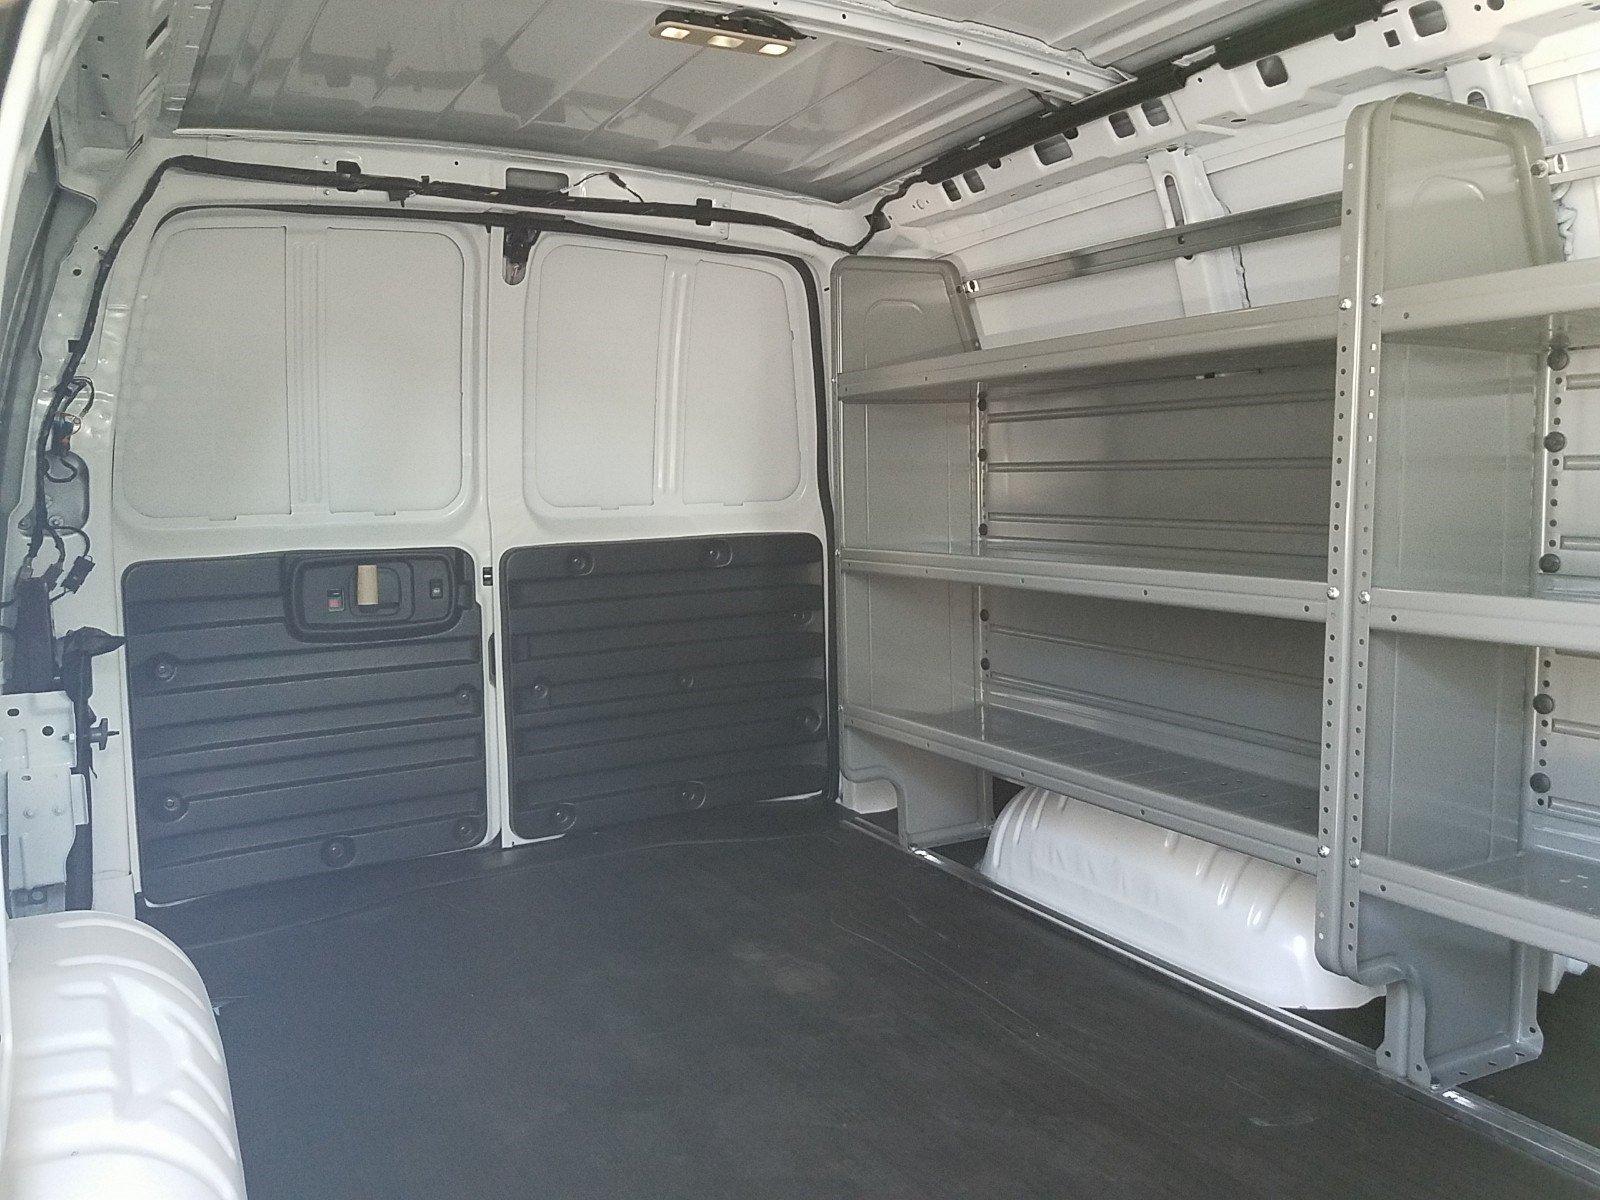 2019 Express 2500 4x2,  Adrian Steel Upfitted Cargo Van #K1258781 - photo 1